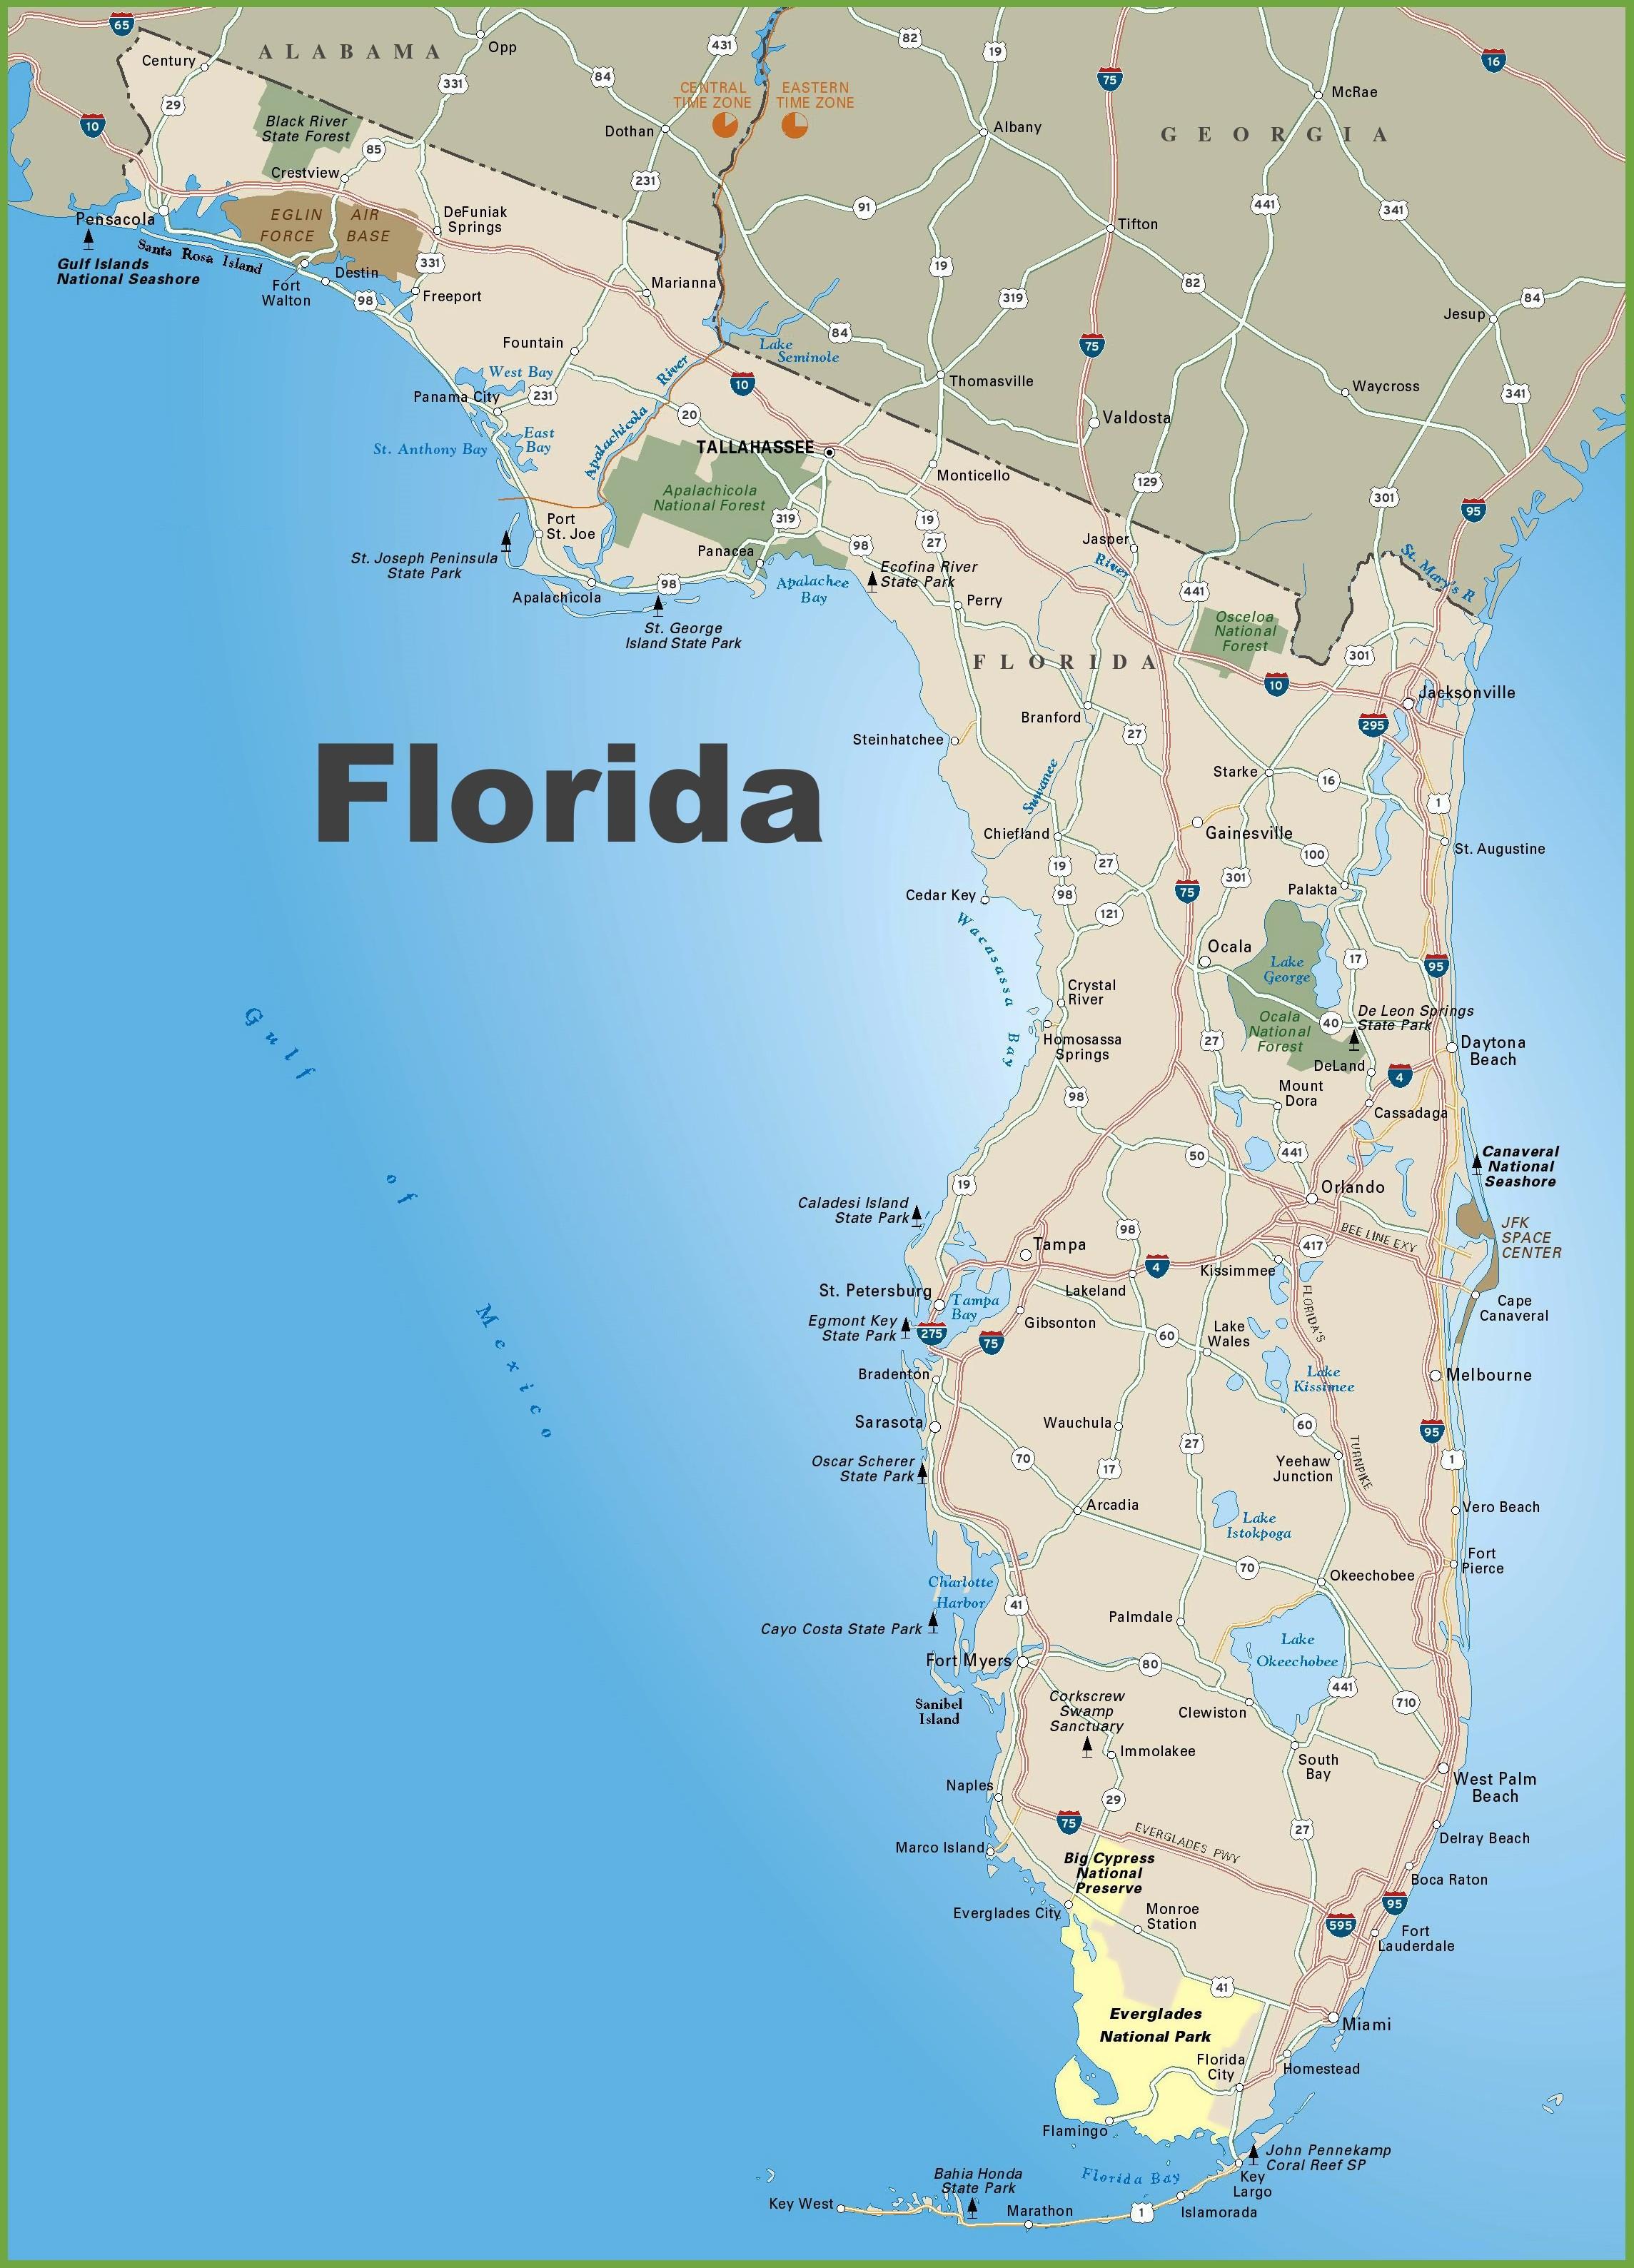 United States Map Miami Florida New United States Map Miami Florida - Miami Florida Map